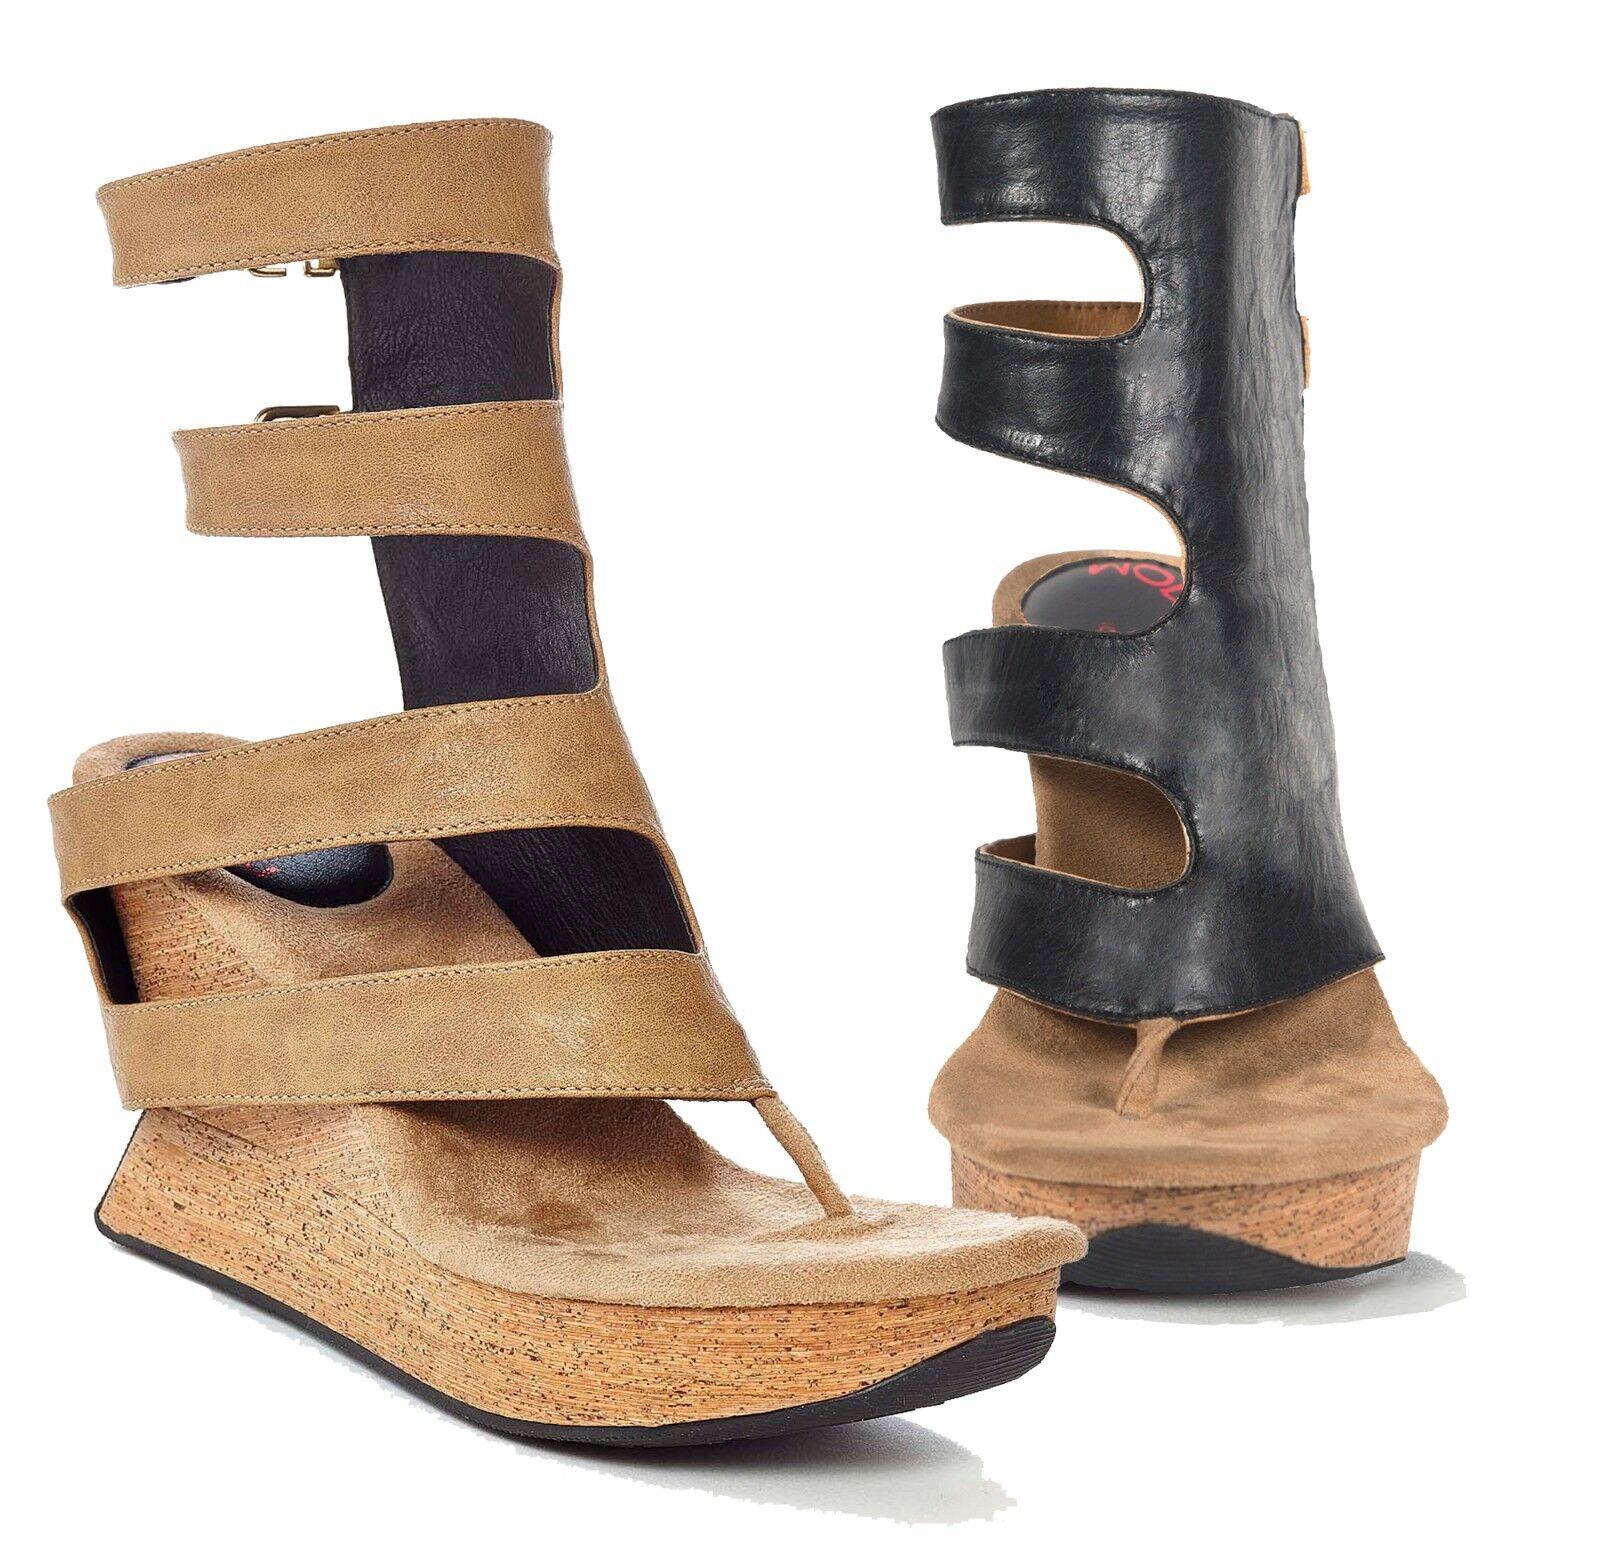 Modzori Vita Women's High Wedge Reversible Twister Sandal